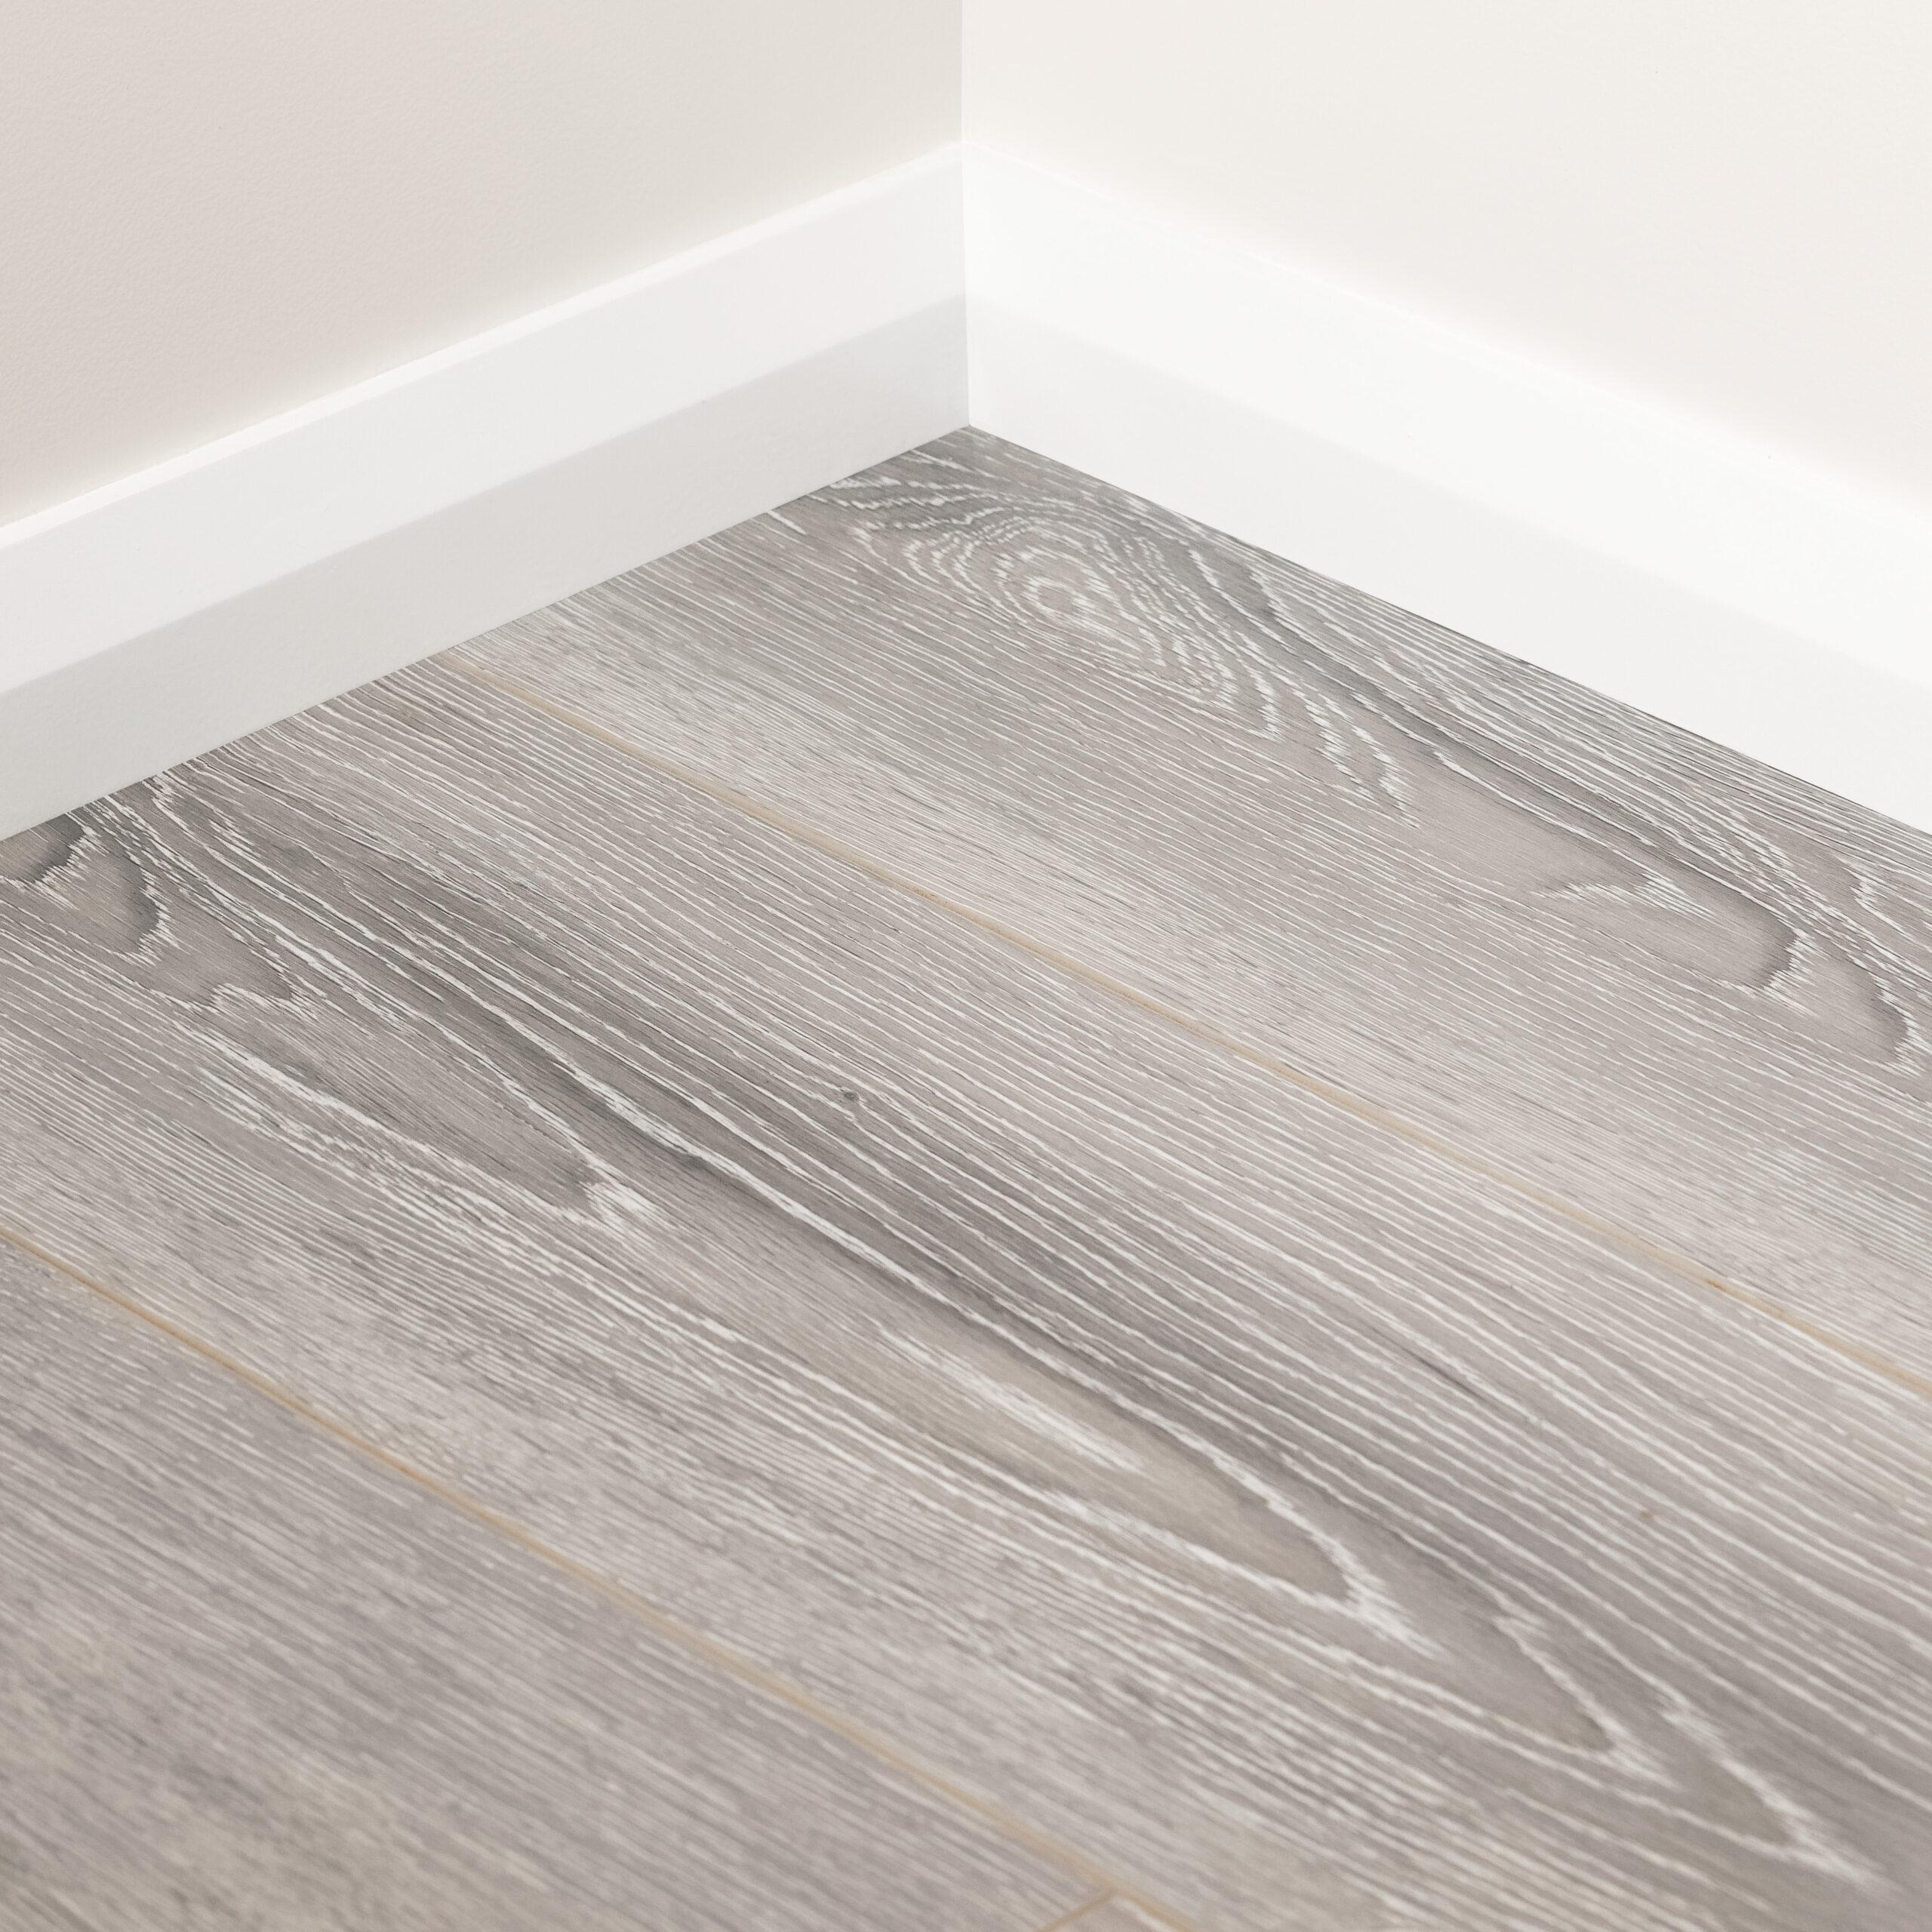 Tanoa Flooring 12mm Extra Wide Laminate, Grey Wash Laminate Flooring